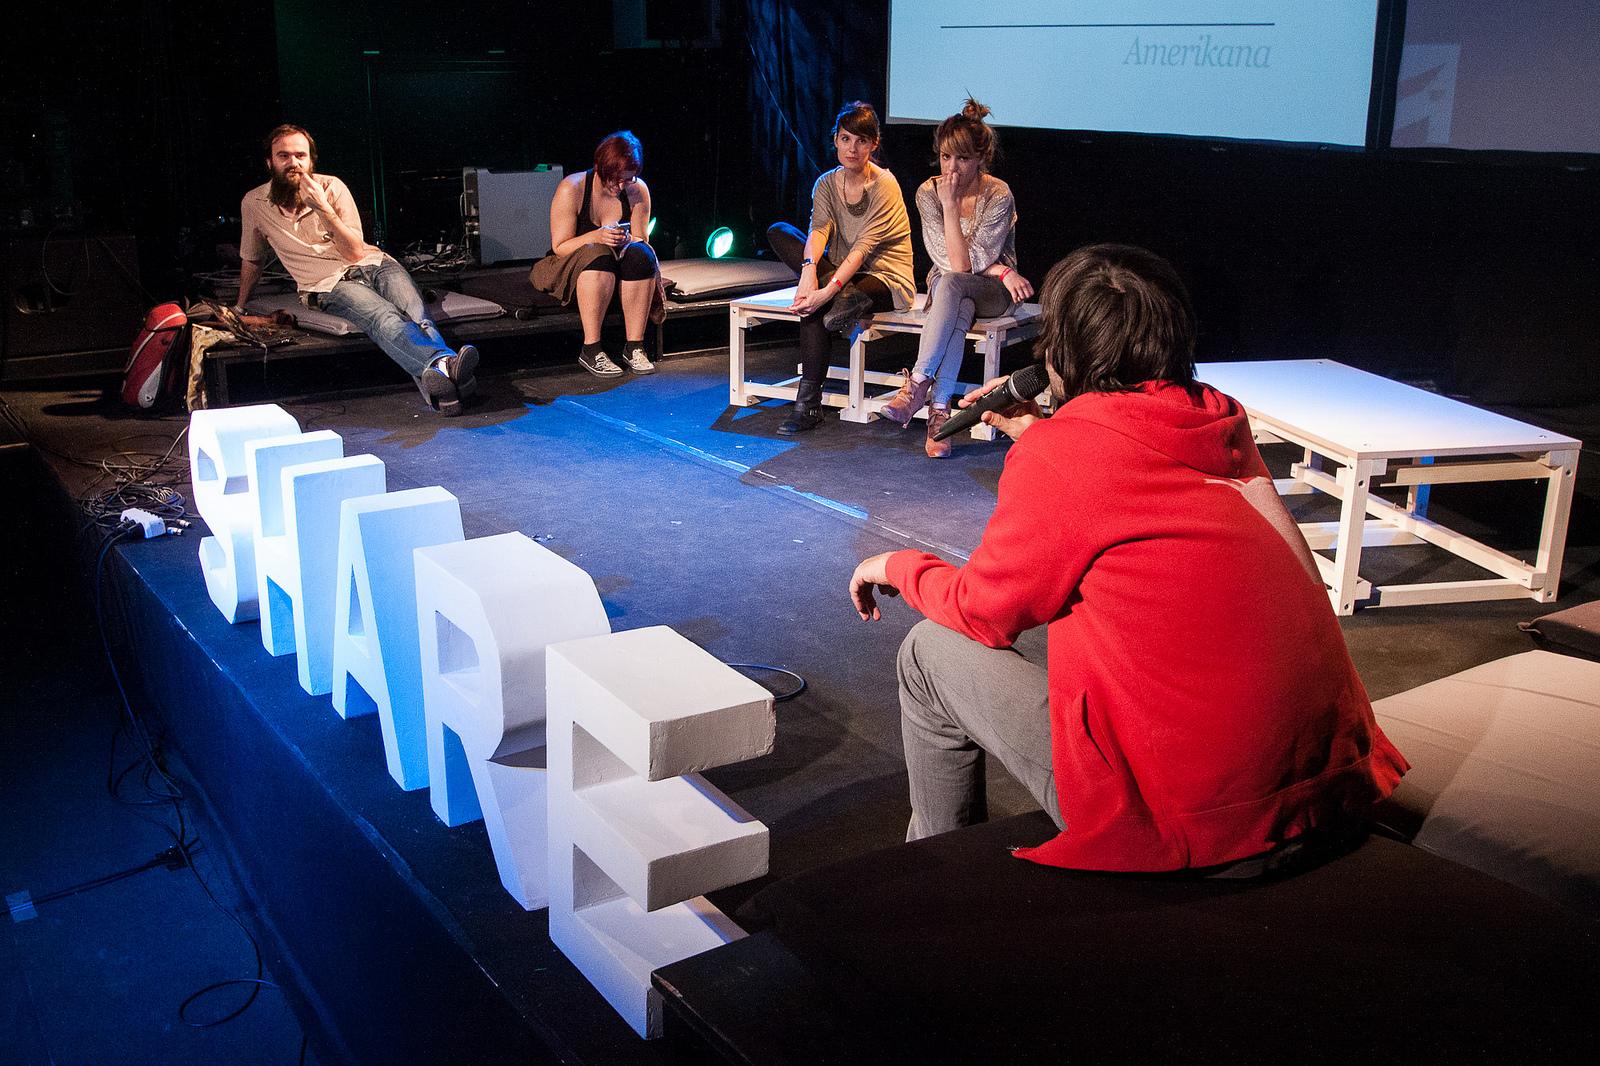 SHARE Conference in Beirut - September 2012